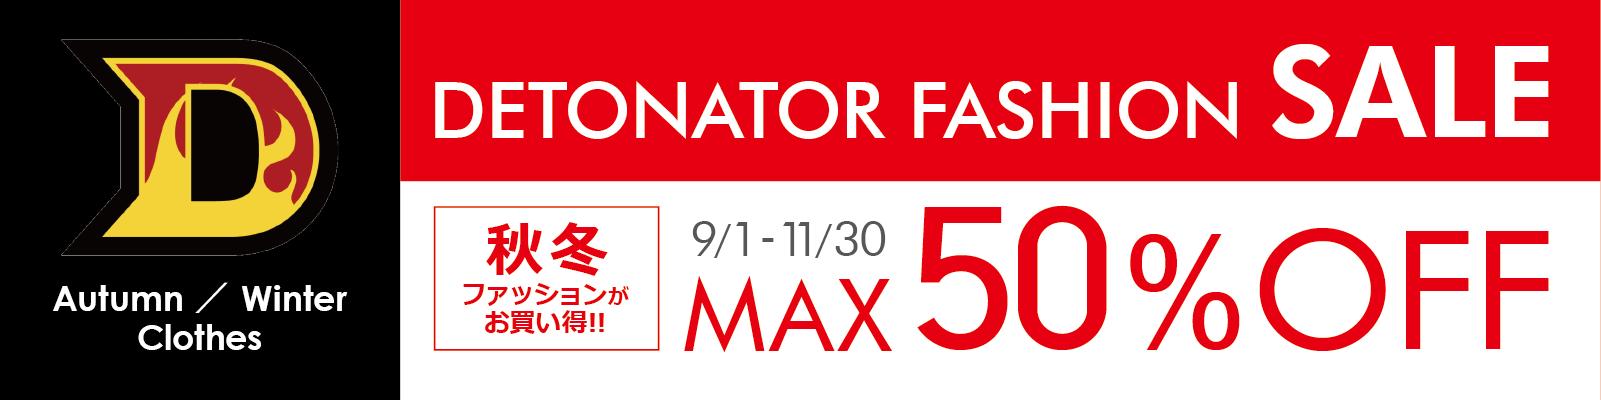 MAX 30%OFF SALE開催! - DETONATOR FASHION